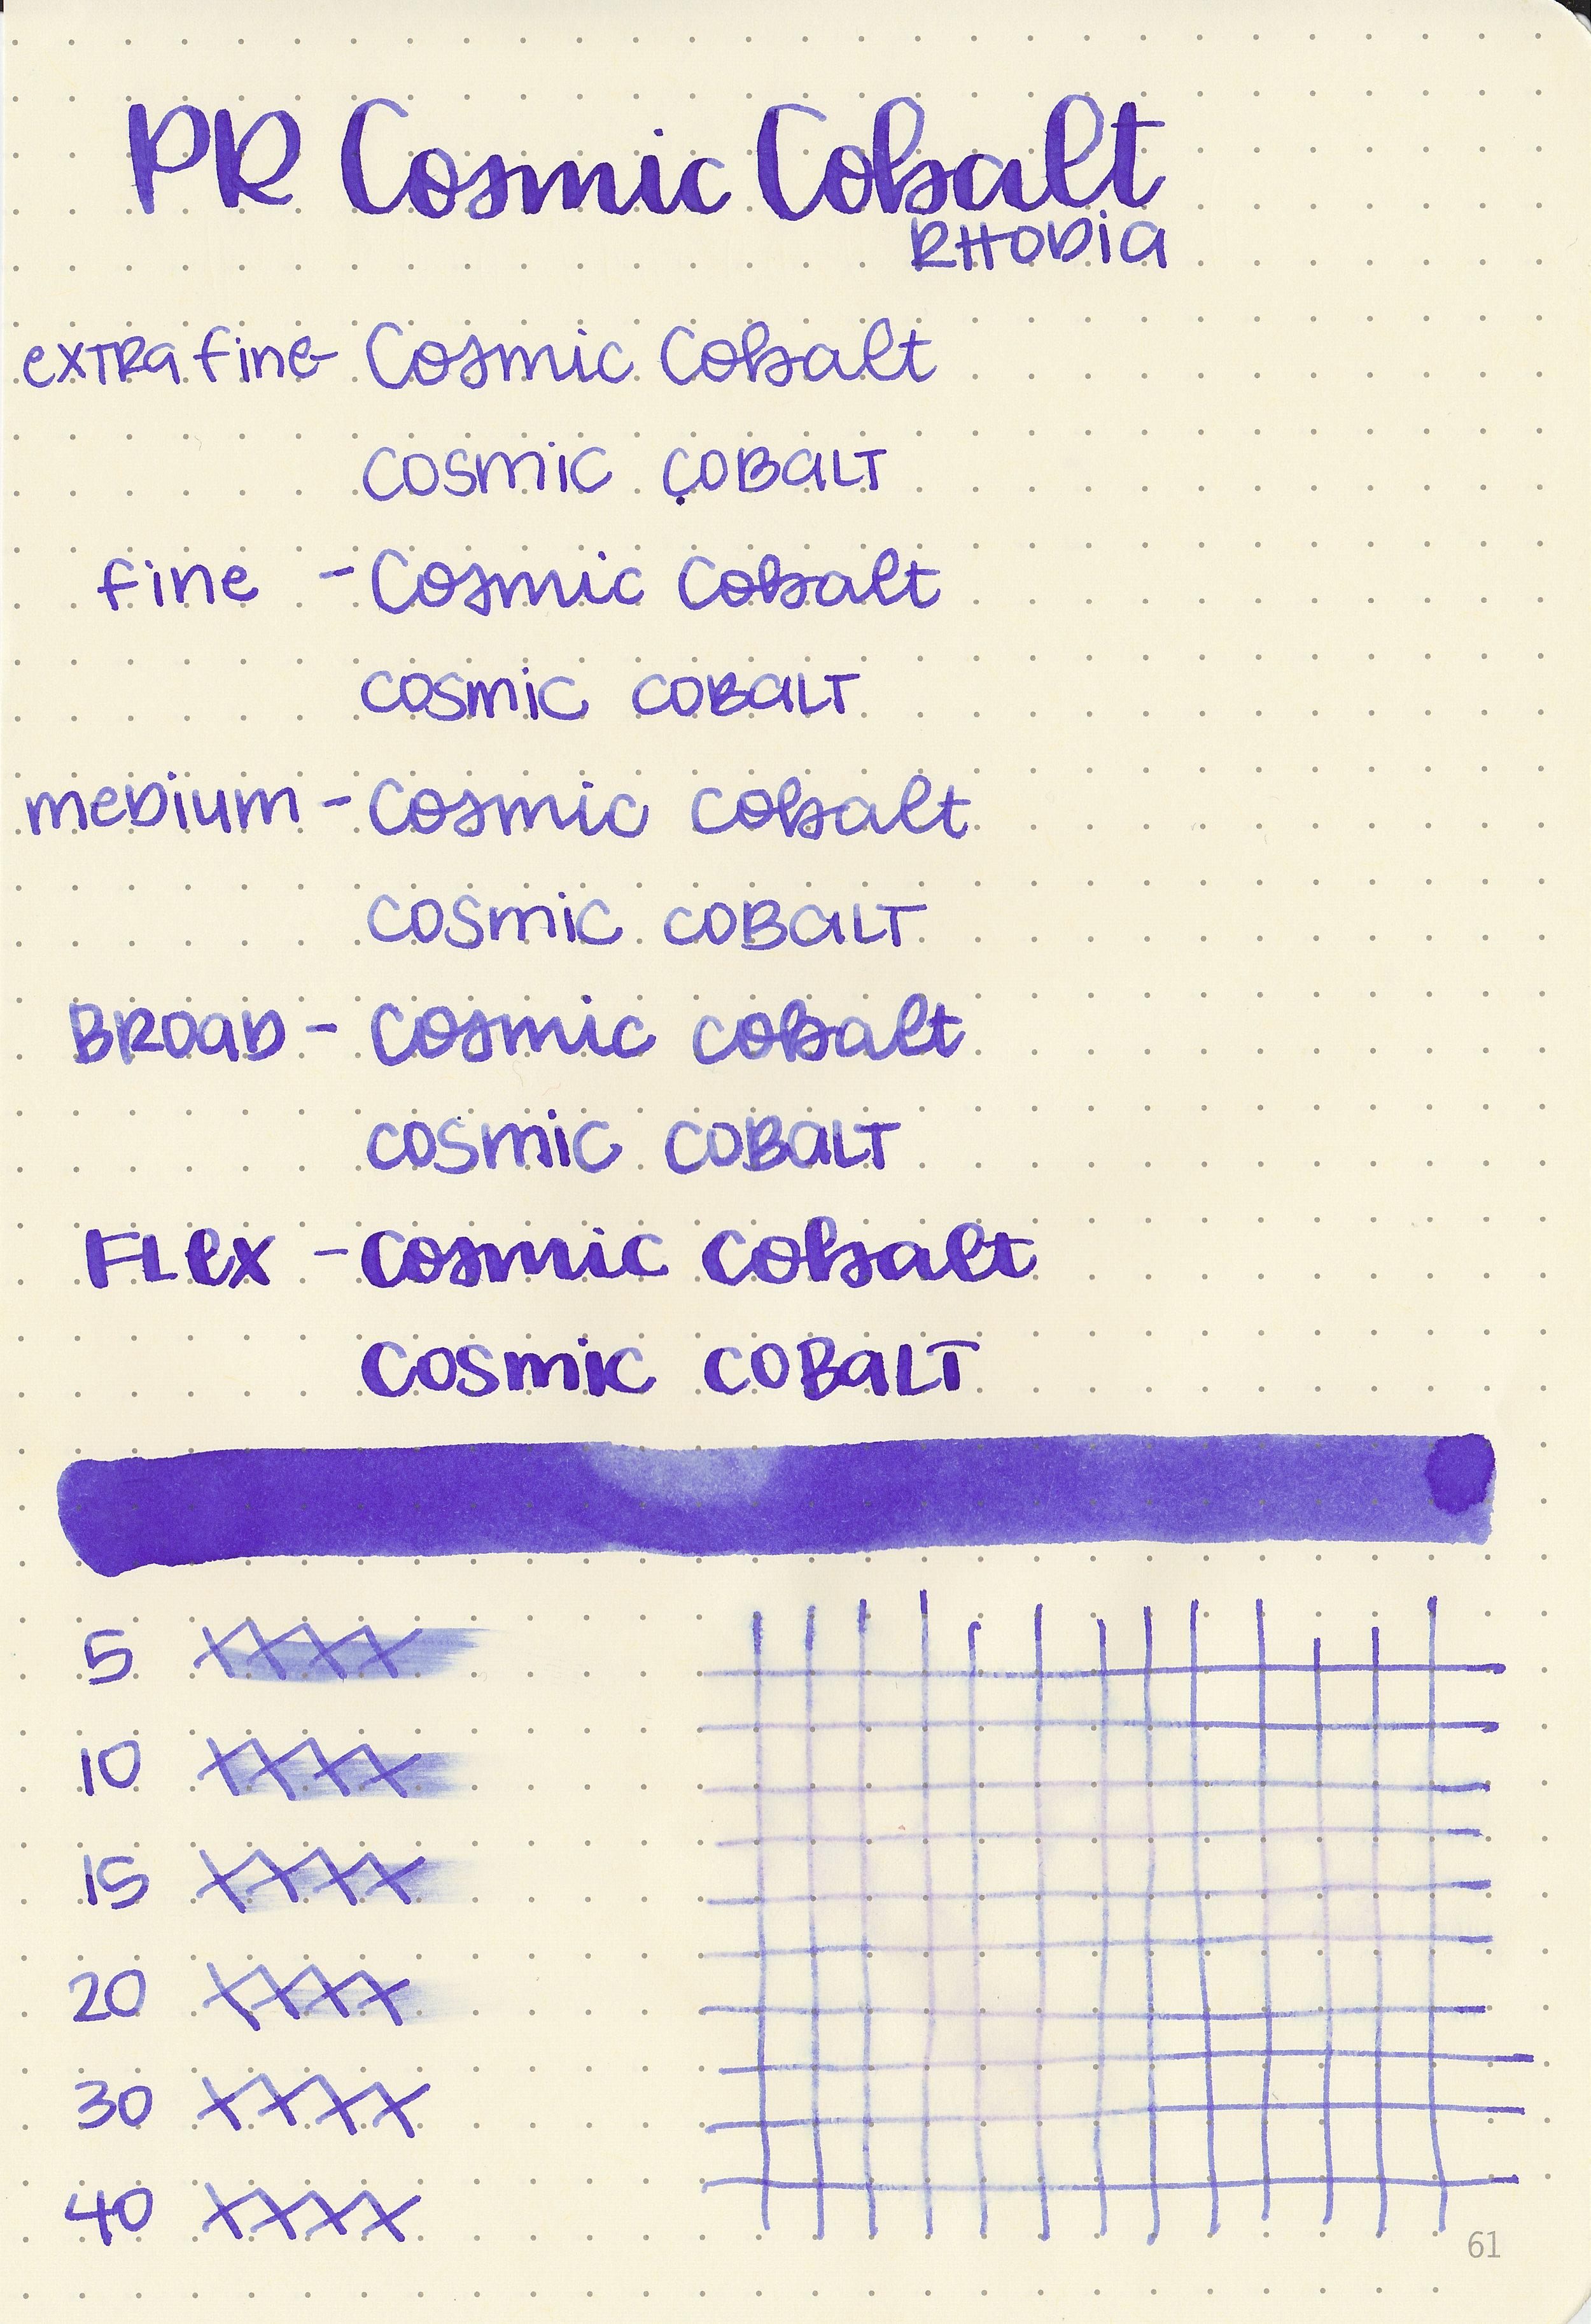 pr-cosmic-cobalt-6.jpg